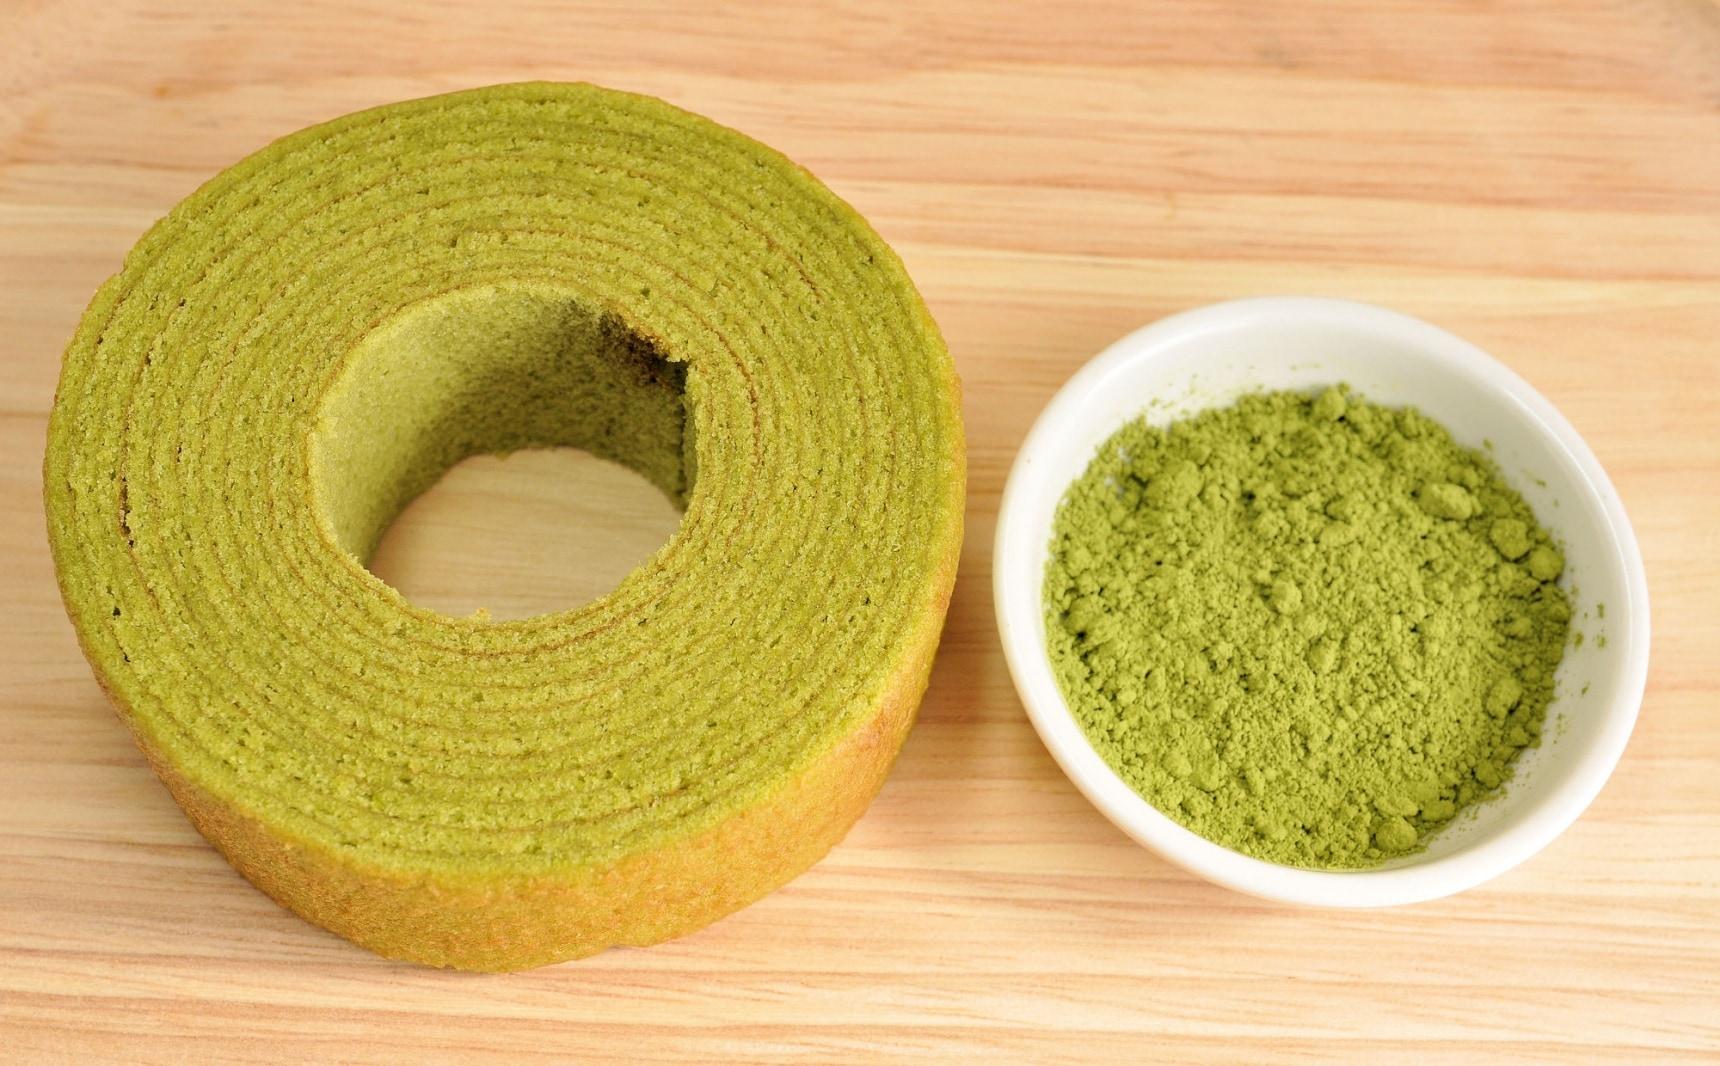 Top 5 Kansai Souvenirs for a Sweet Tooth